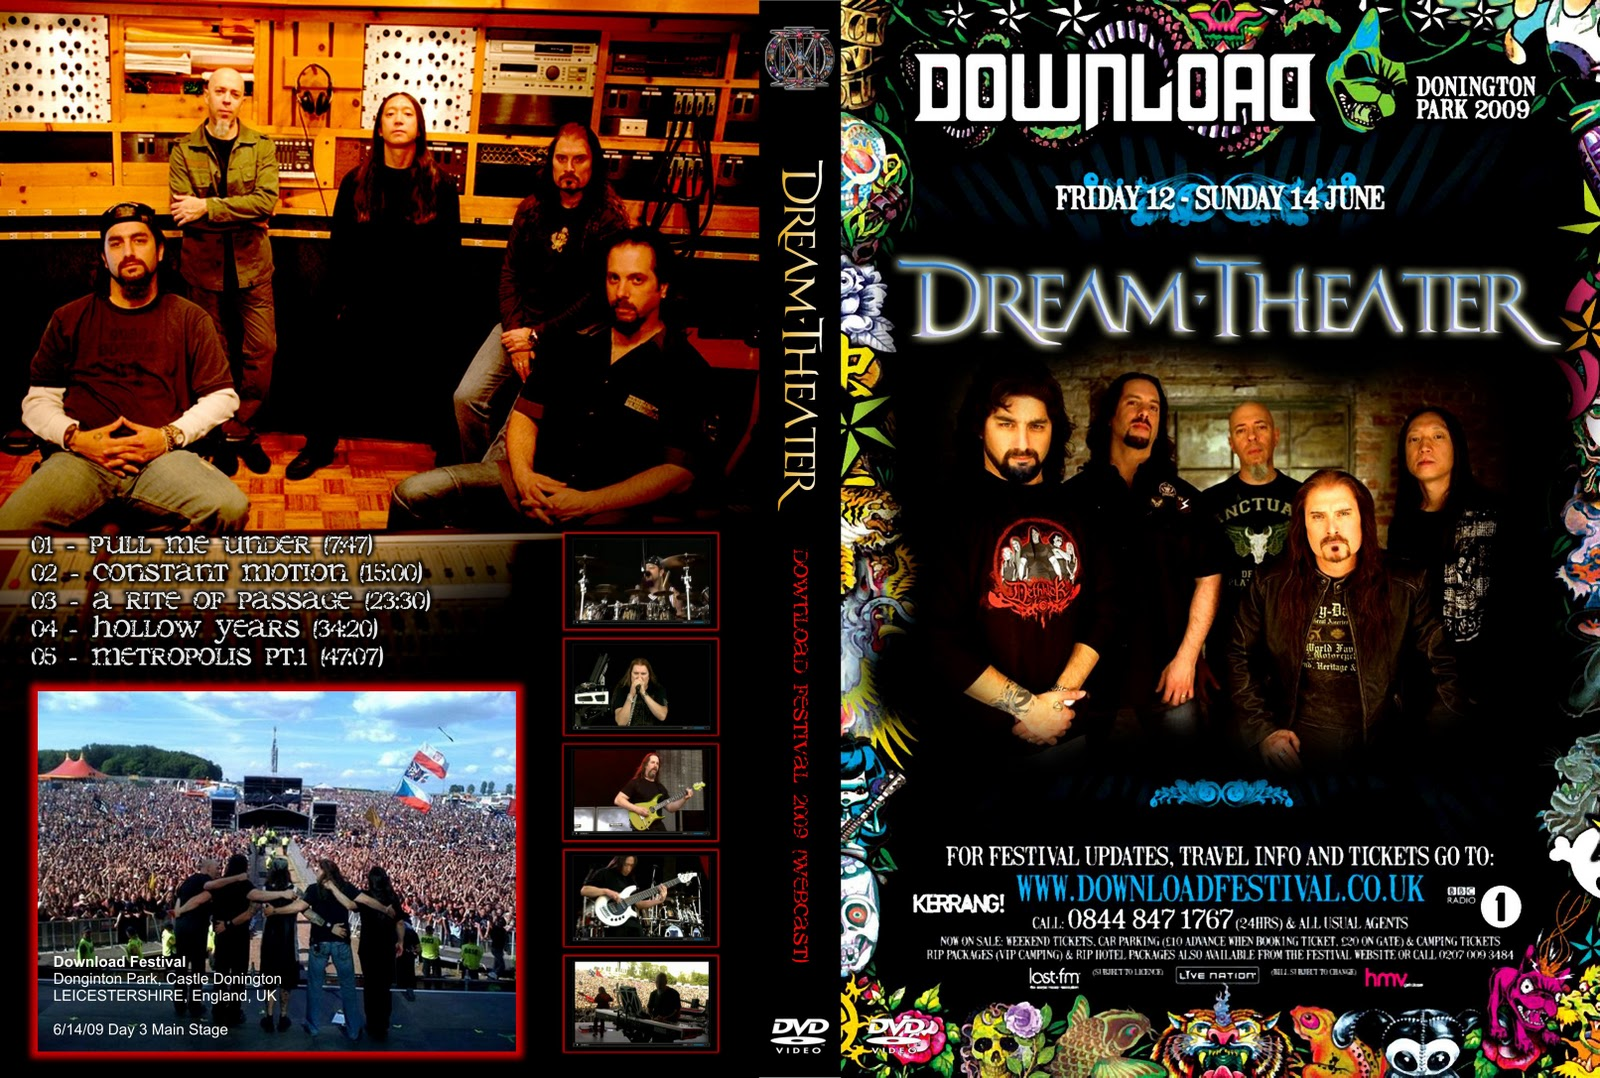 http://3.bp.blogspot.com/-sfDX446AzyM/TiDaCxQ0n4I/AAAAAAAABkE/40DRON5VB_4/s1600/DreamTheater+-+2009-06-14+-+Download+Festival.jpg